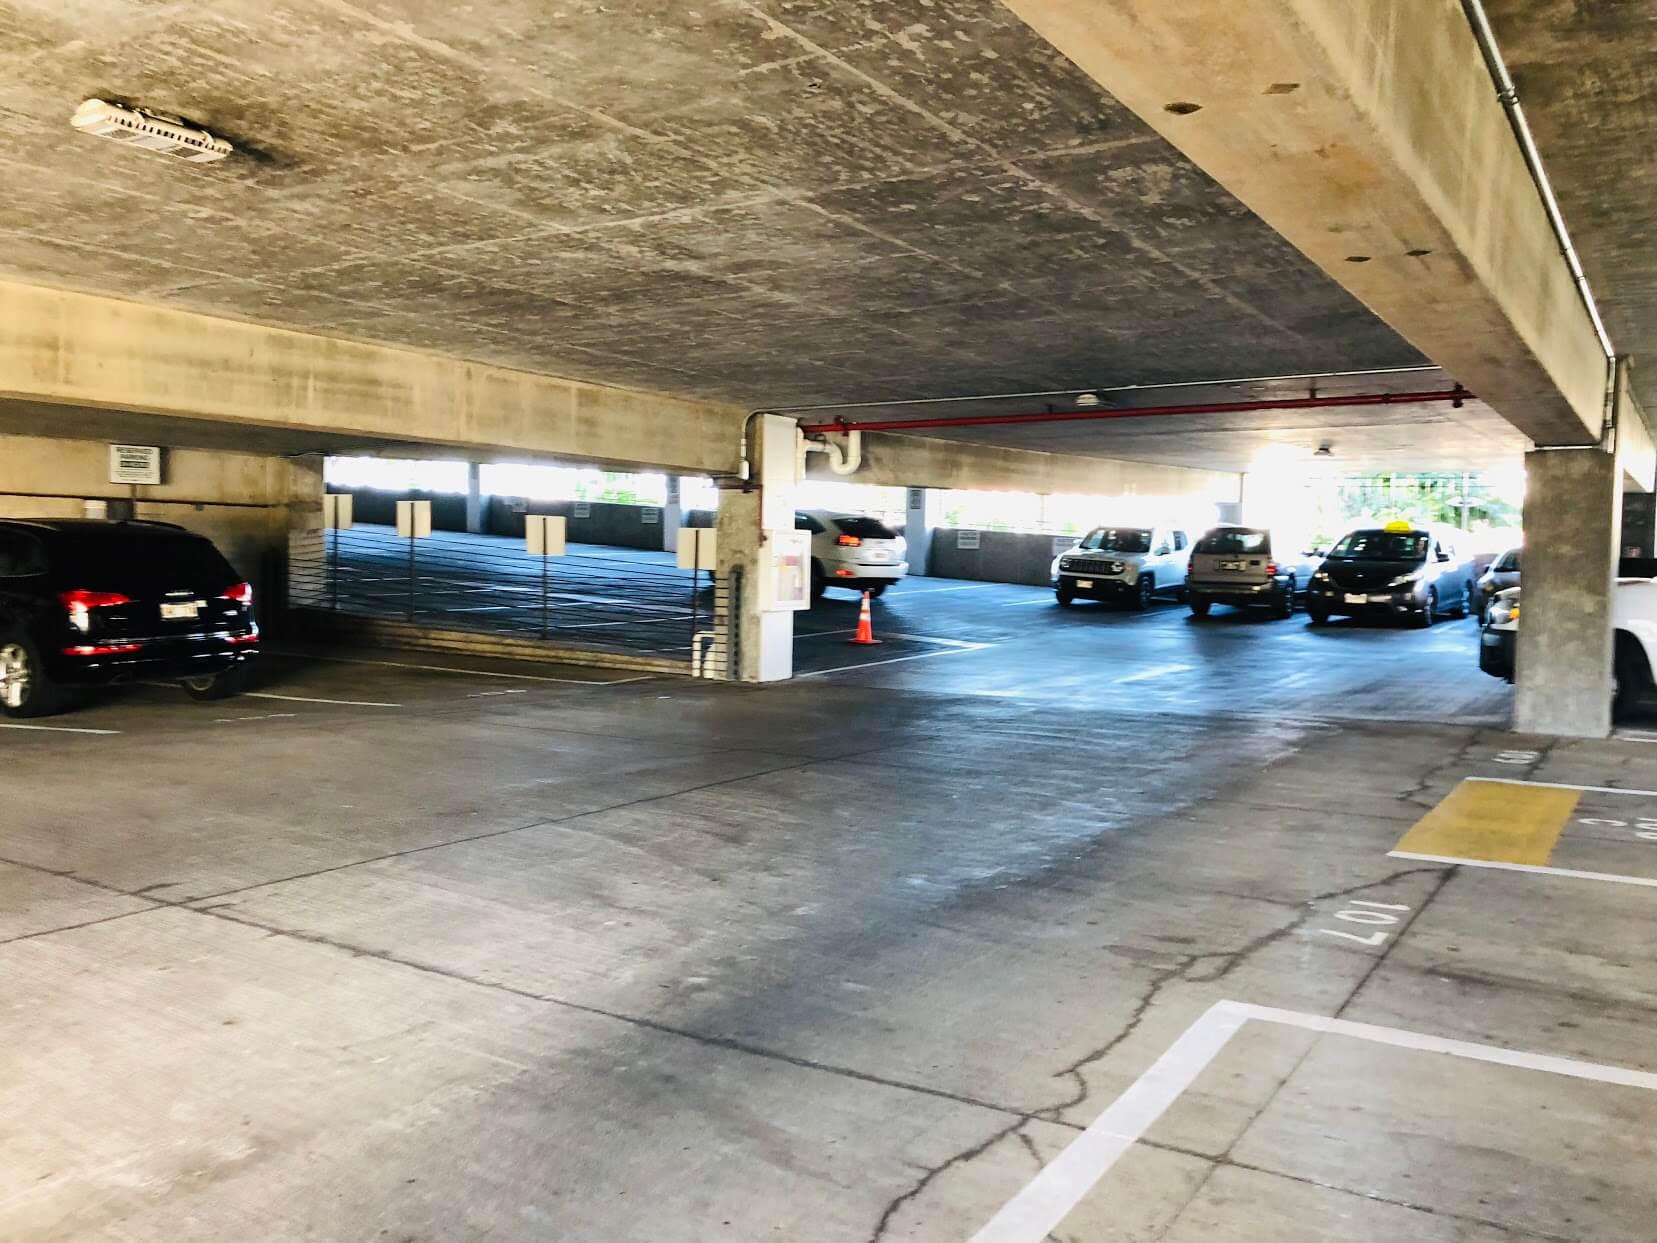 215 North Kingの駐車場